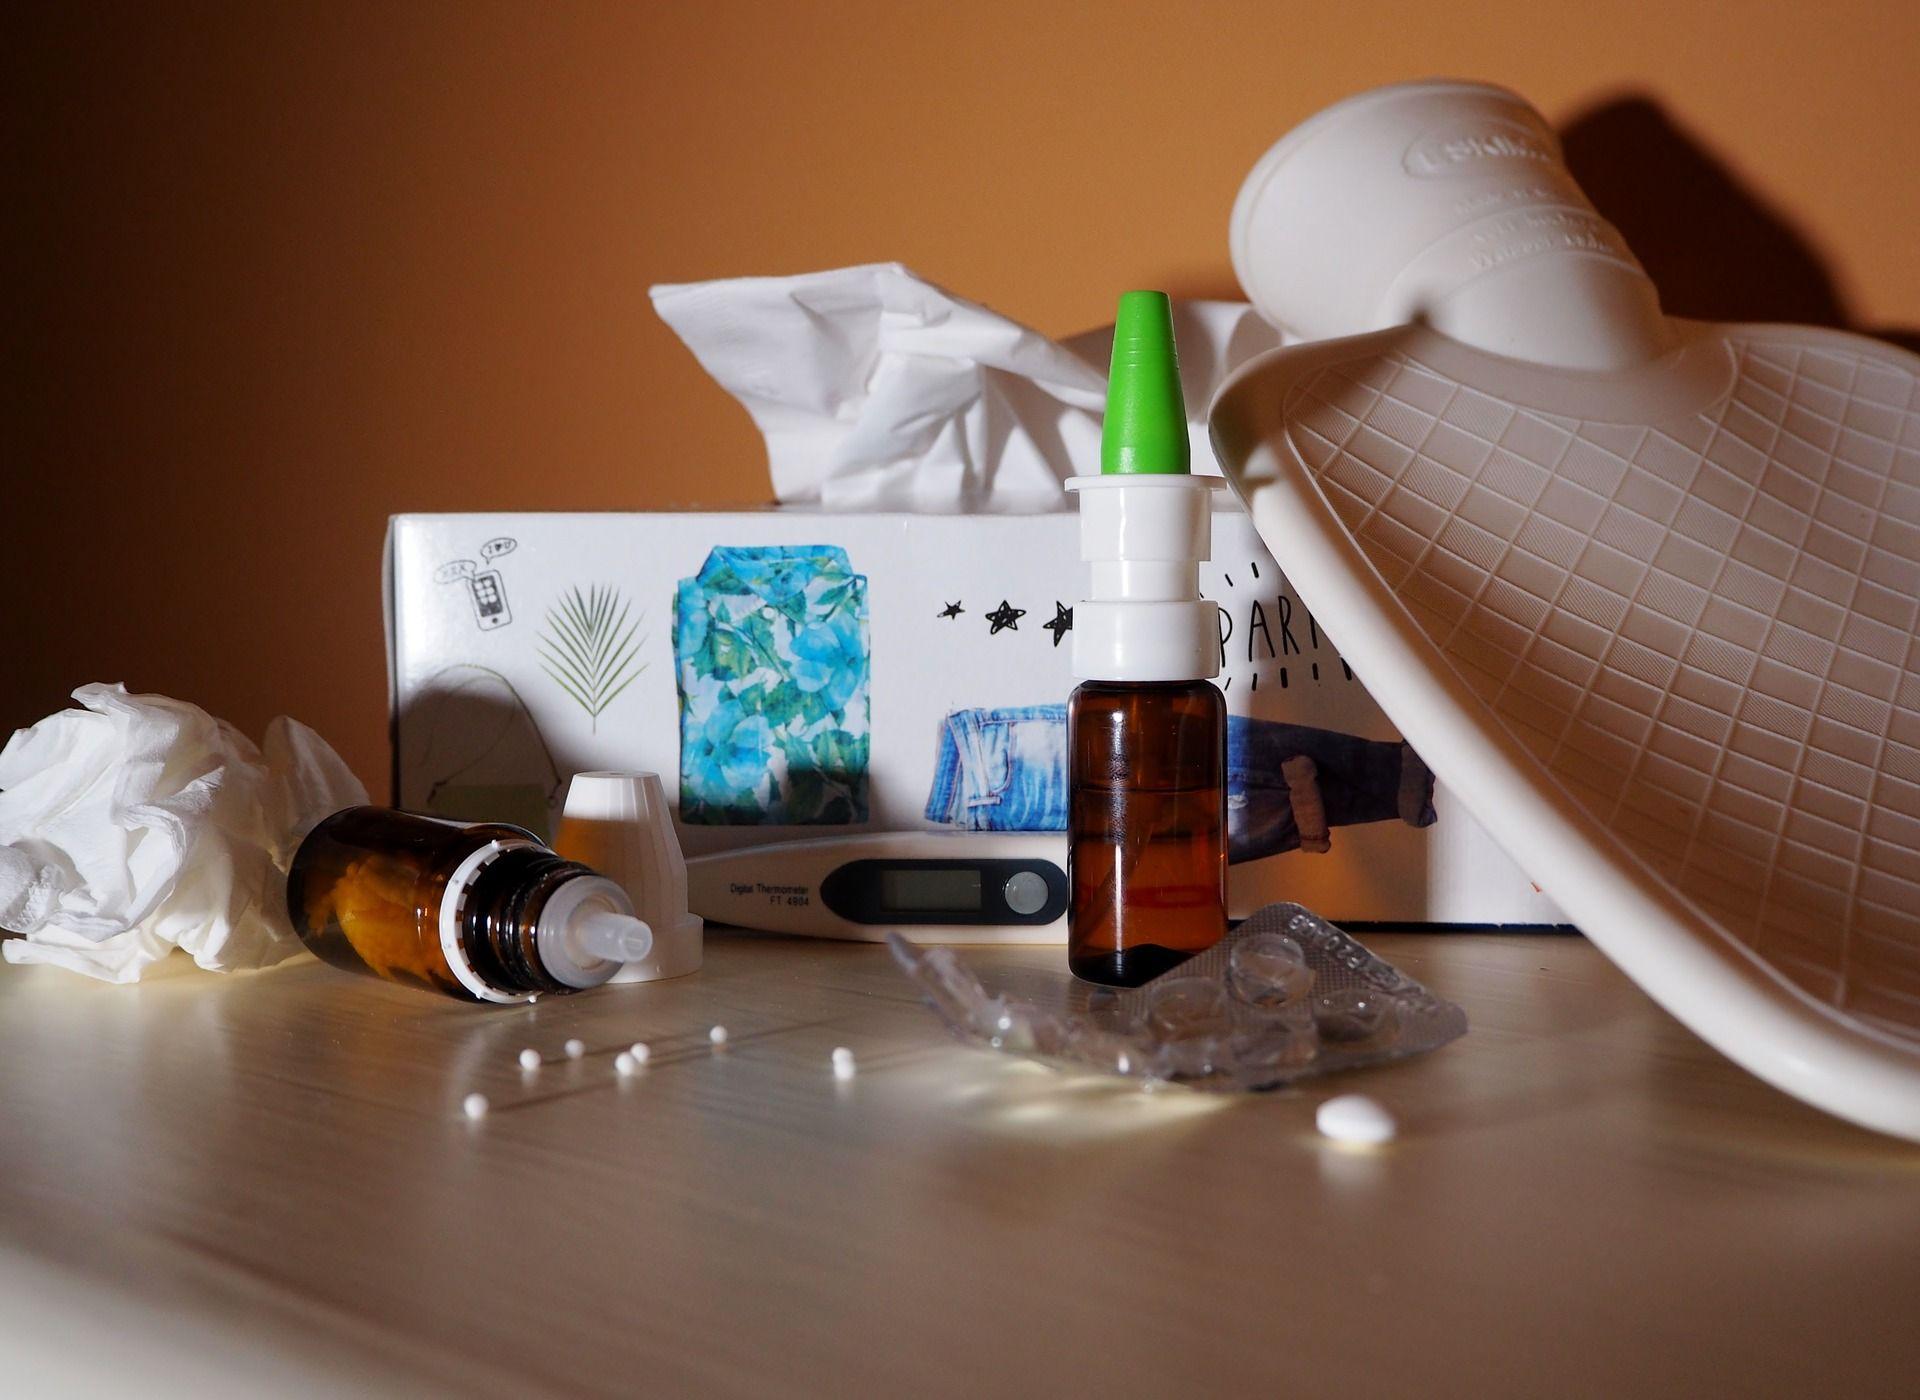 Wie man Erkältungen vorbeugen kann